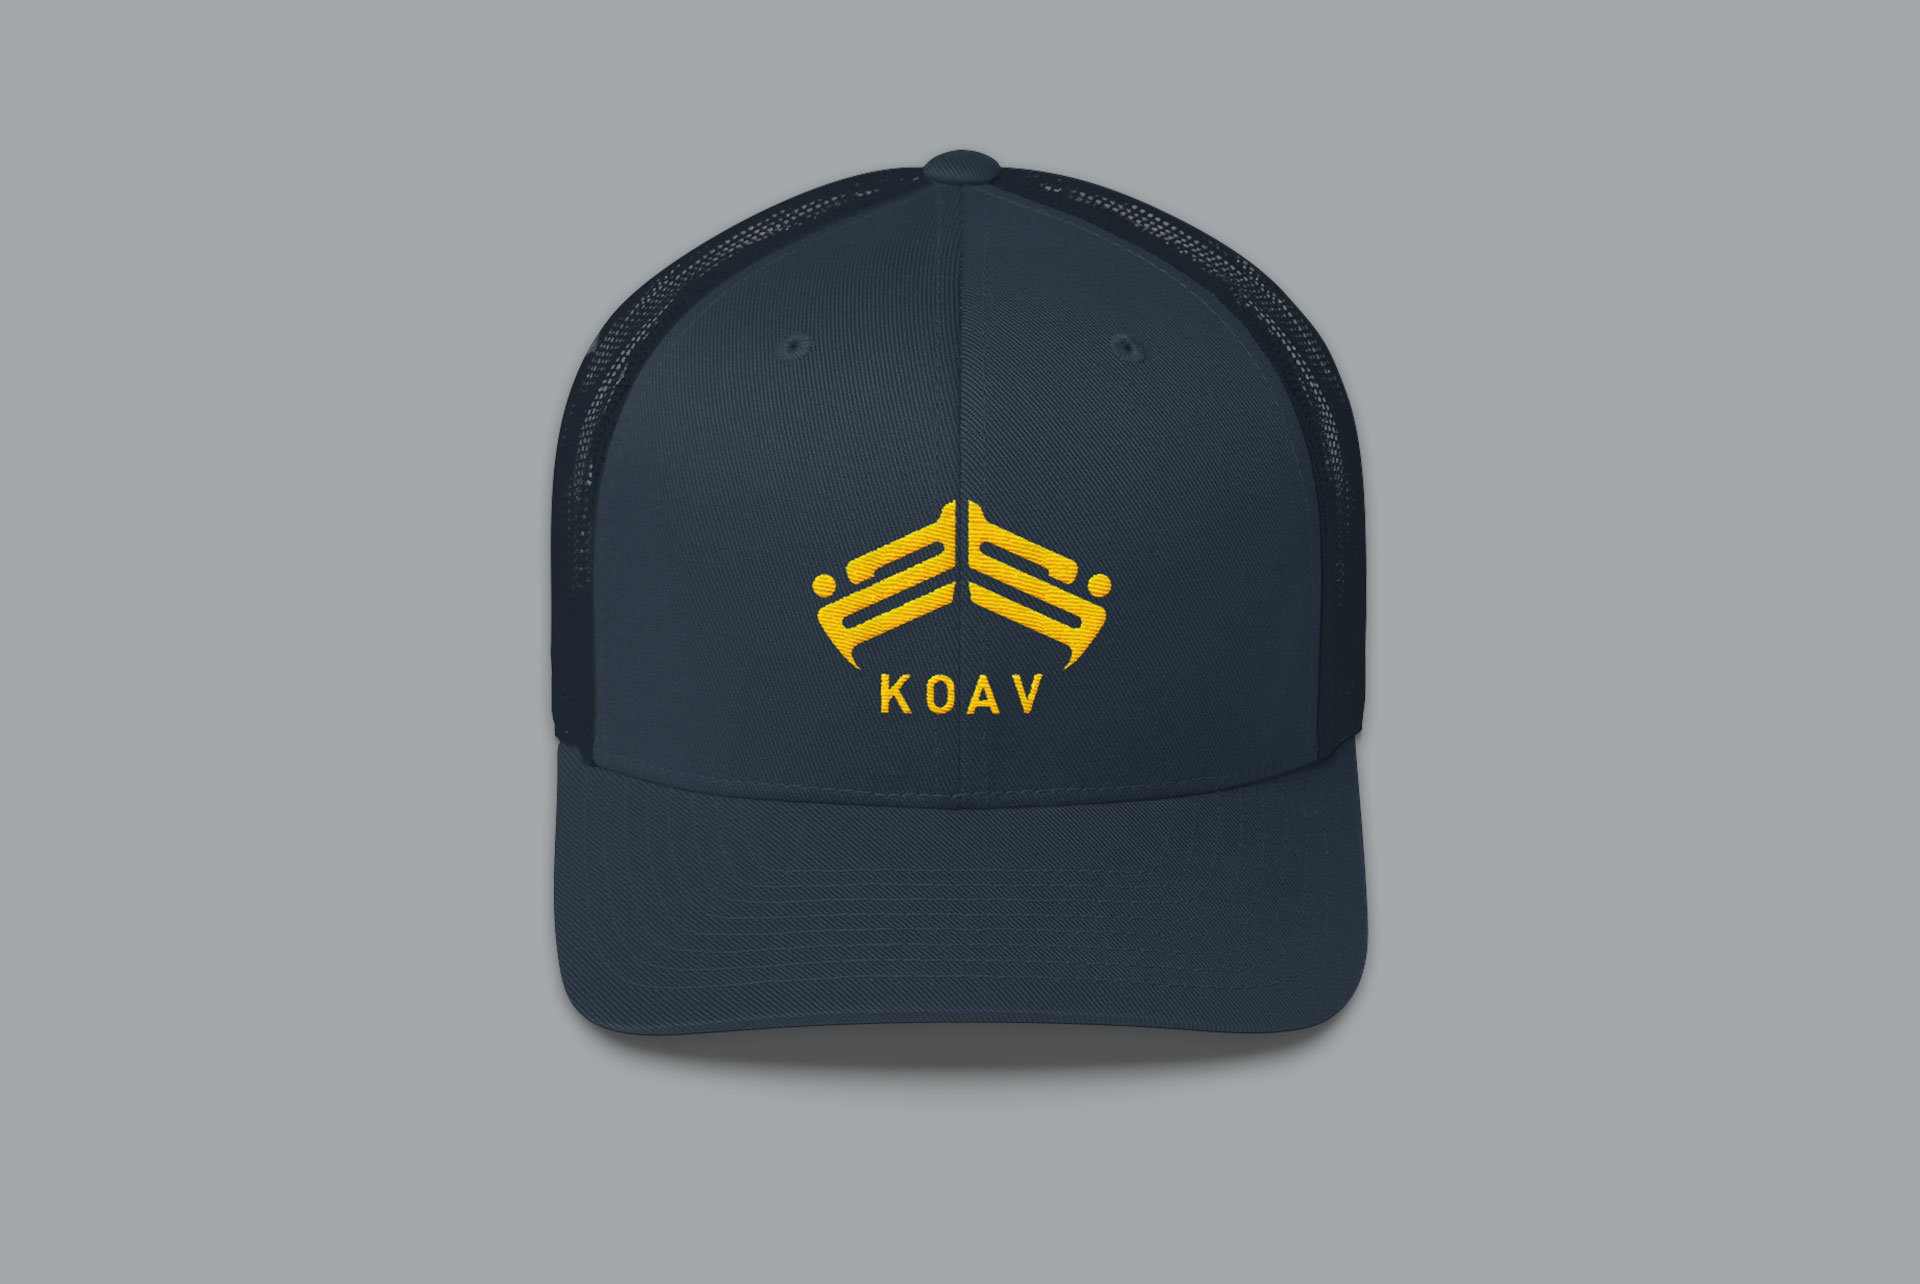 Trucker Snap Back Cap with our KOAV emblem